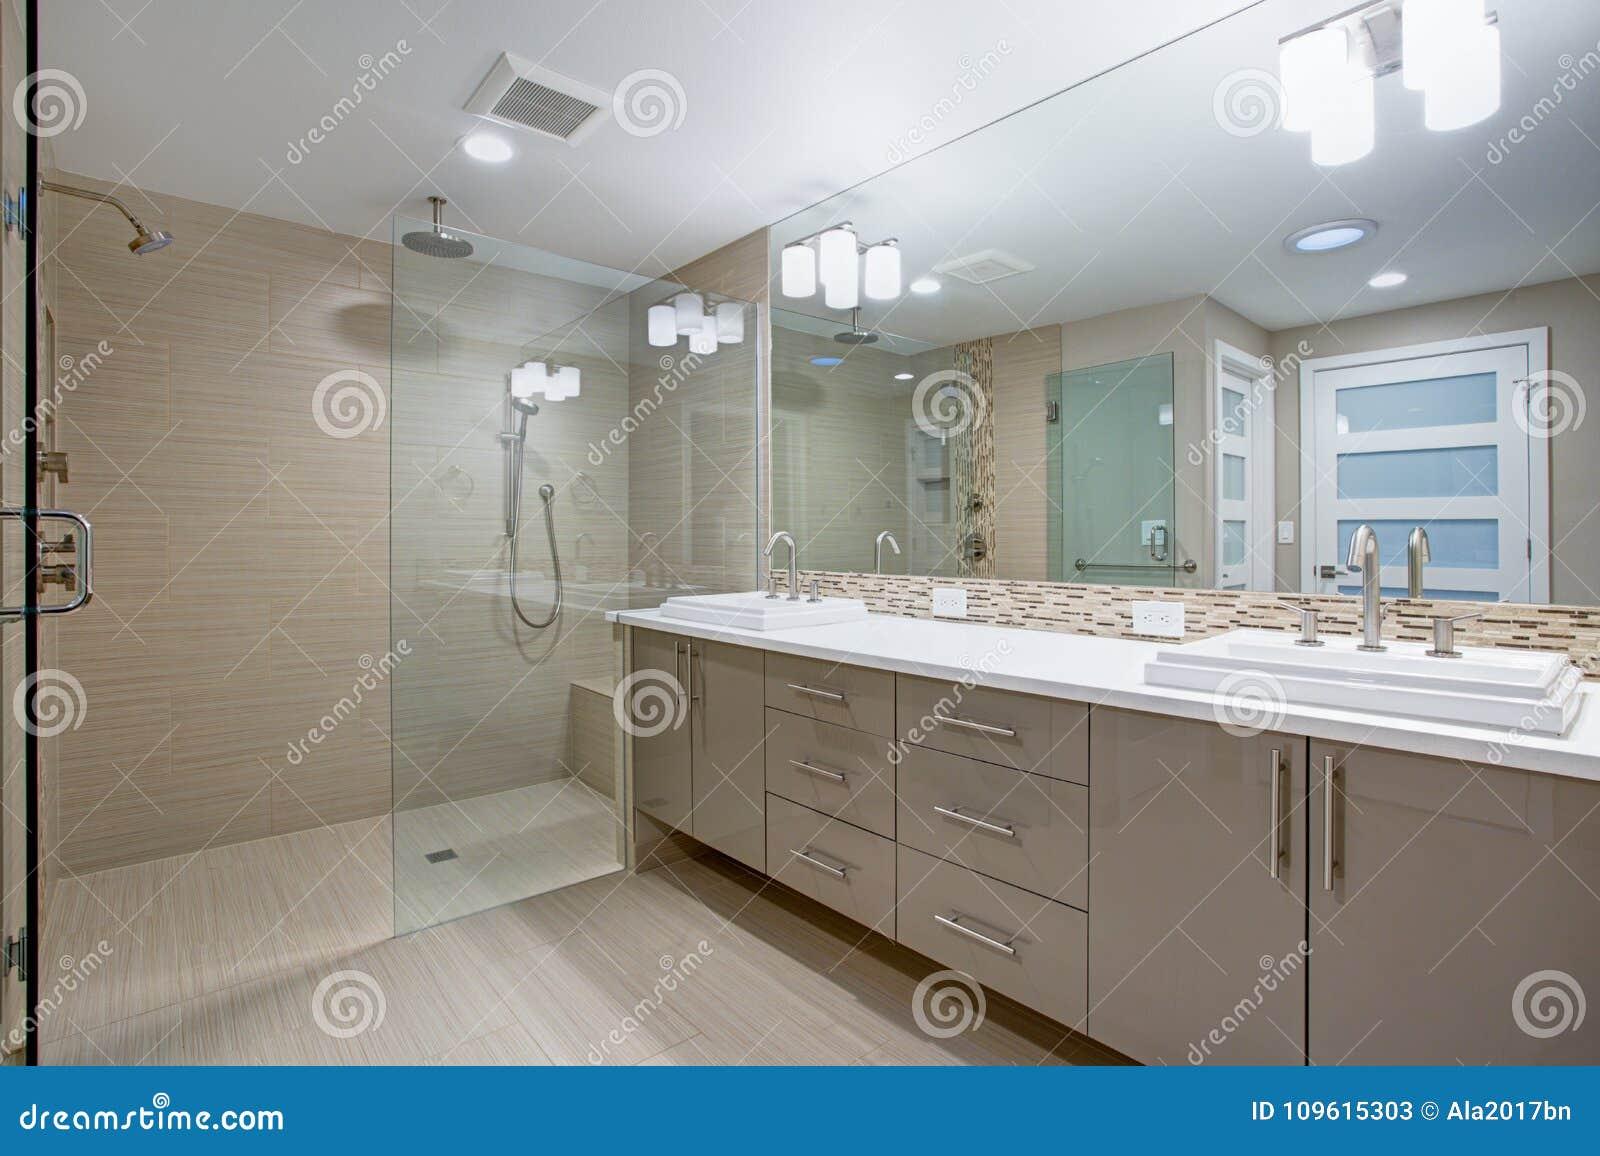 Strange Modern Refreshing Bathroom With A Beige Dual Washstand Download Free Architecture Designs Rallybritishbridgeorg